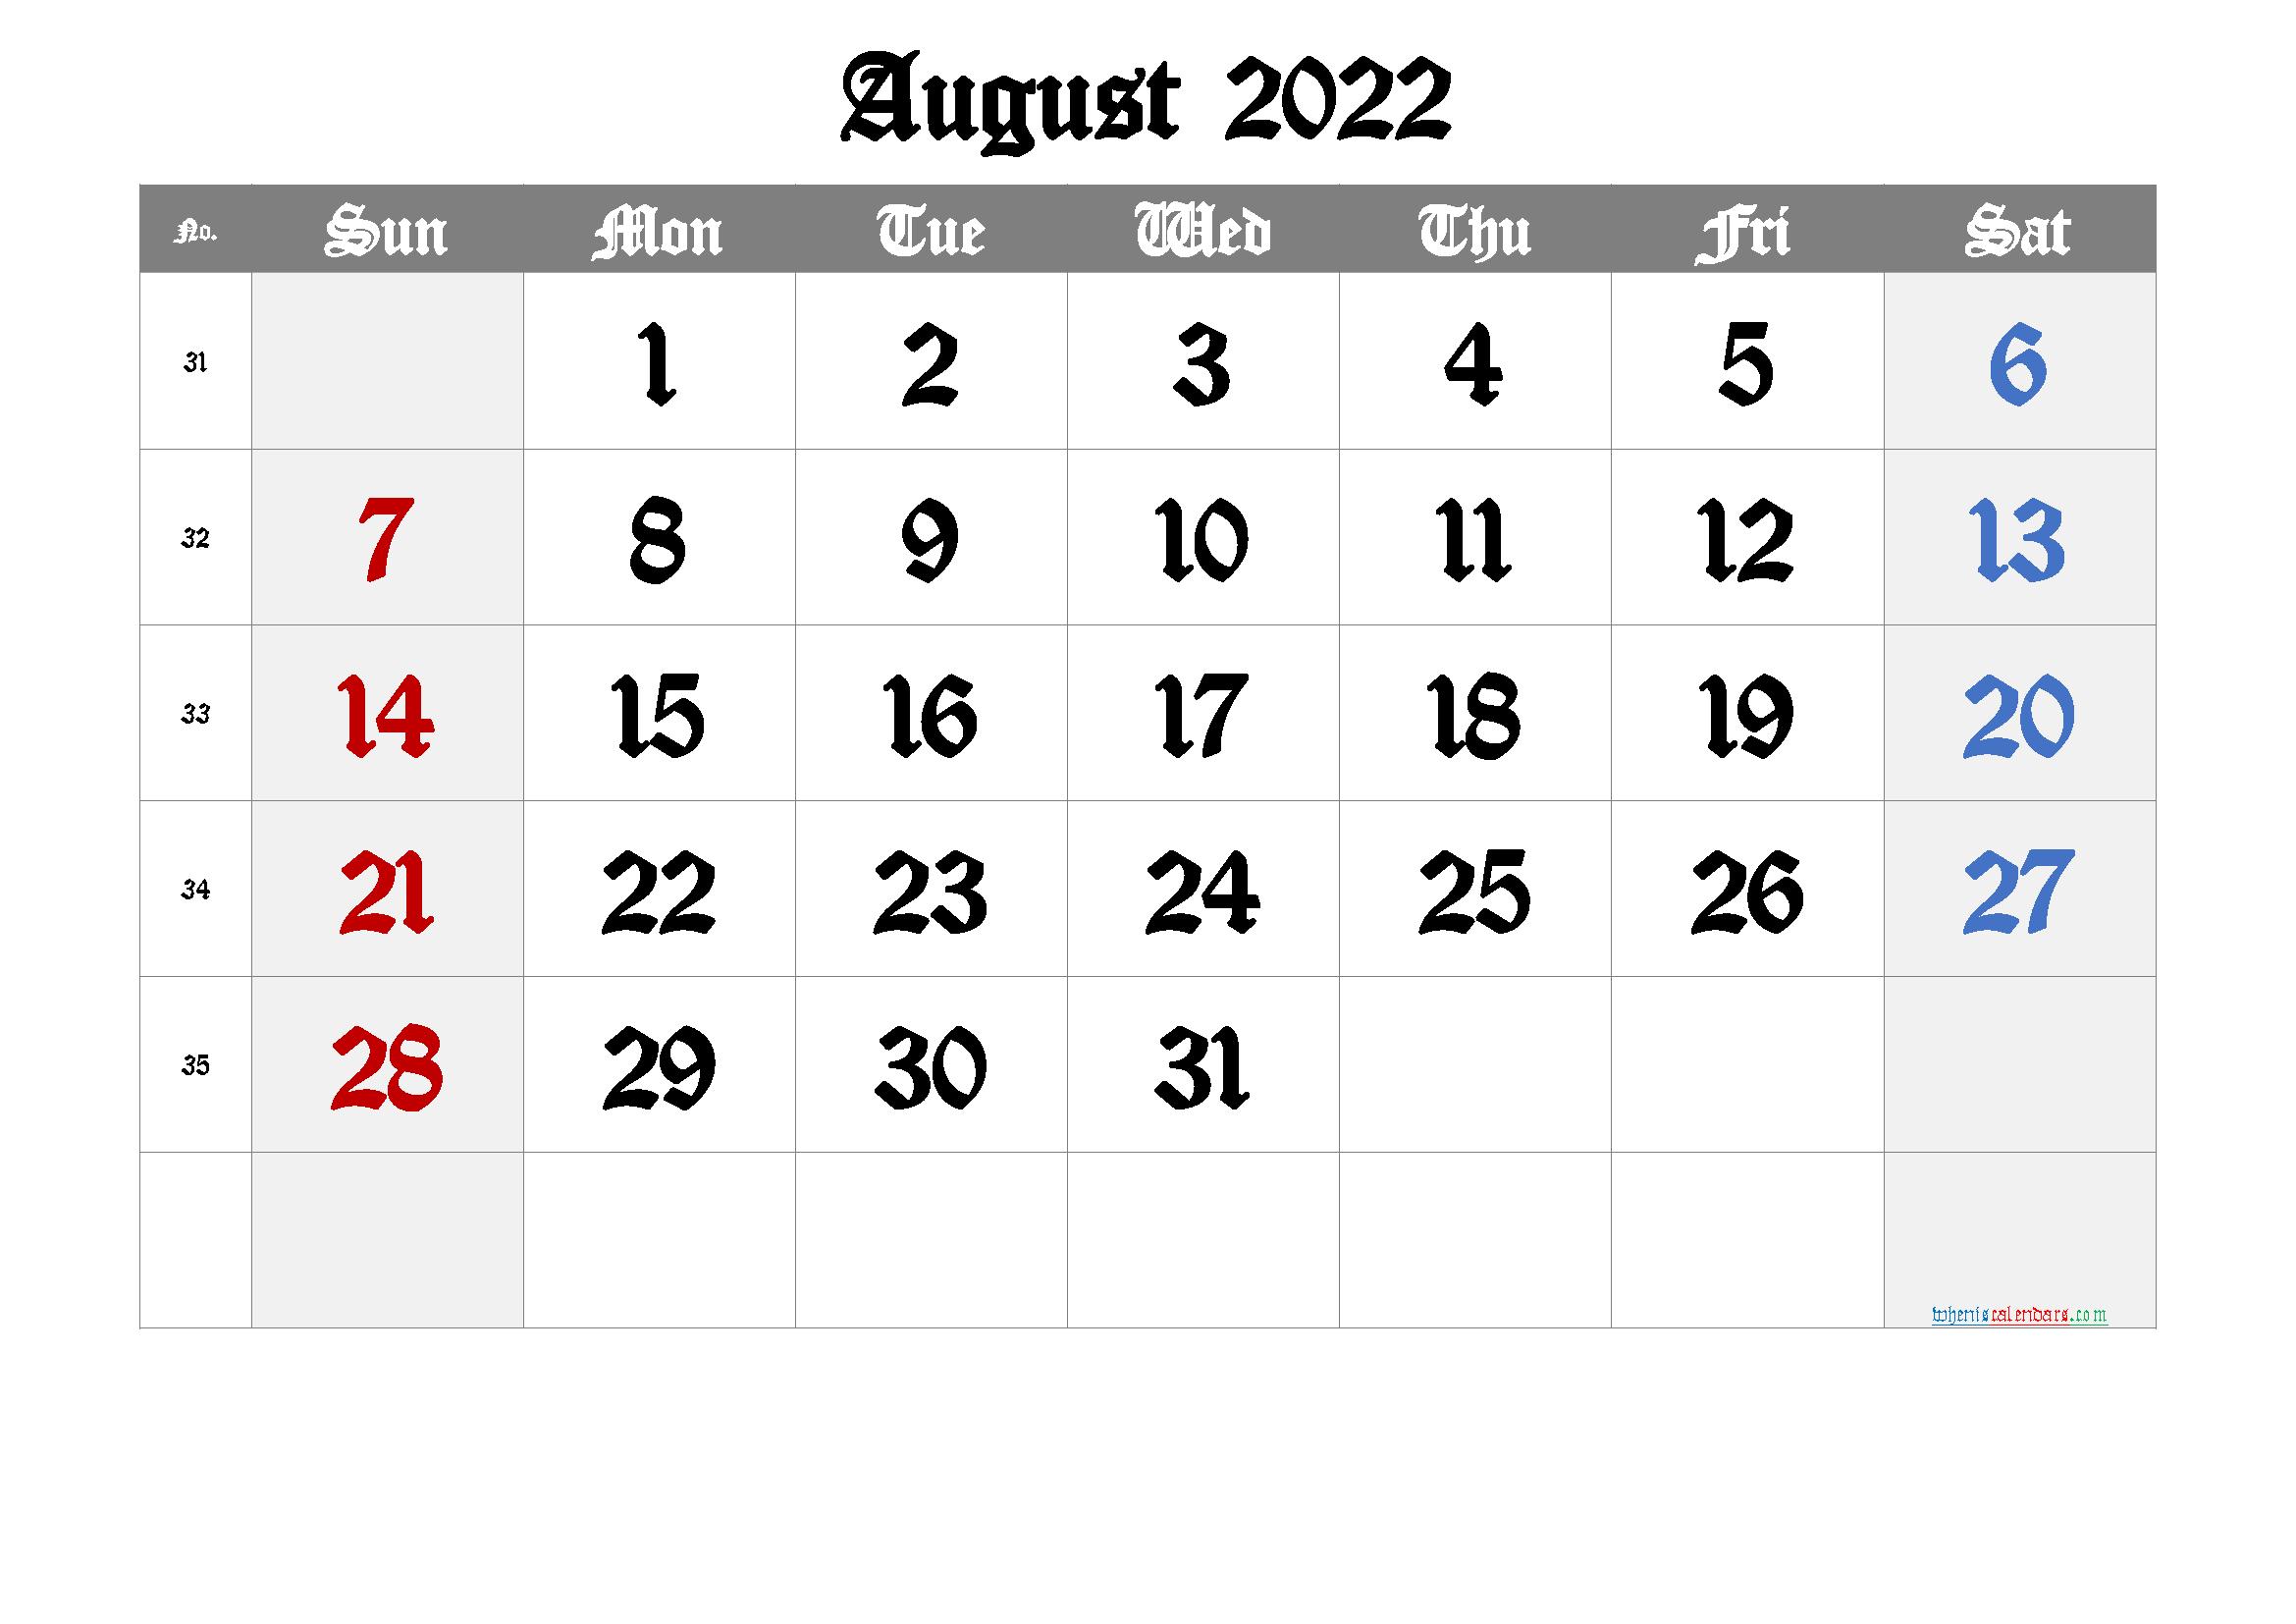 Printable Calendar 2022 August | Free Printable 2020 regarding Printable Monthly Calendar August 2022